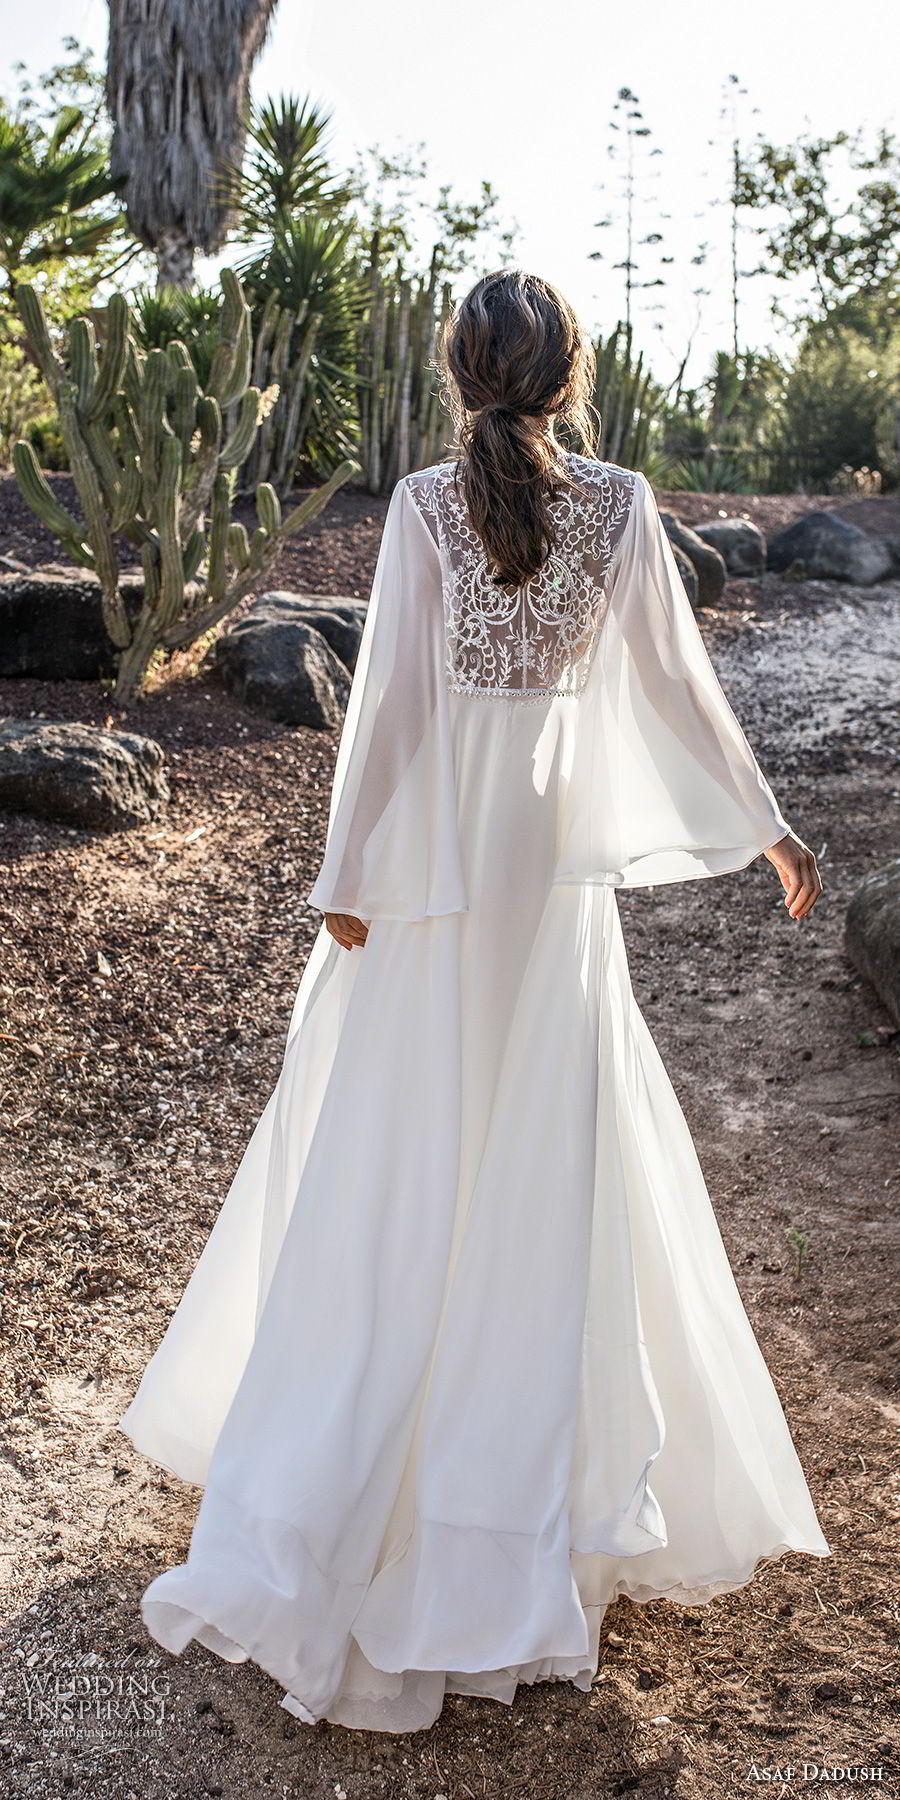 asaf dadush 2018 bridal long sleeves deep plunging sweetheart neckline heavily embellished bodice high slit skirt soft a  line wedding dress covered lace back sweep train (4) bv